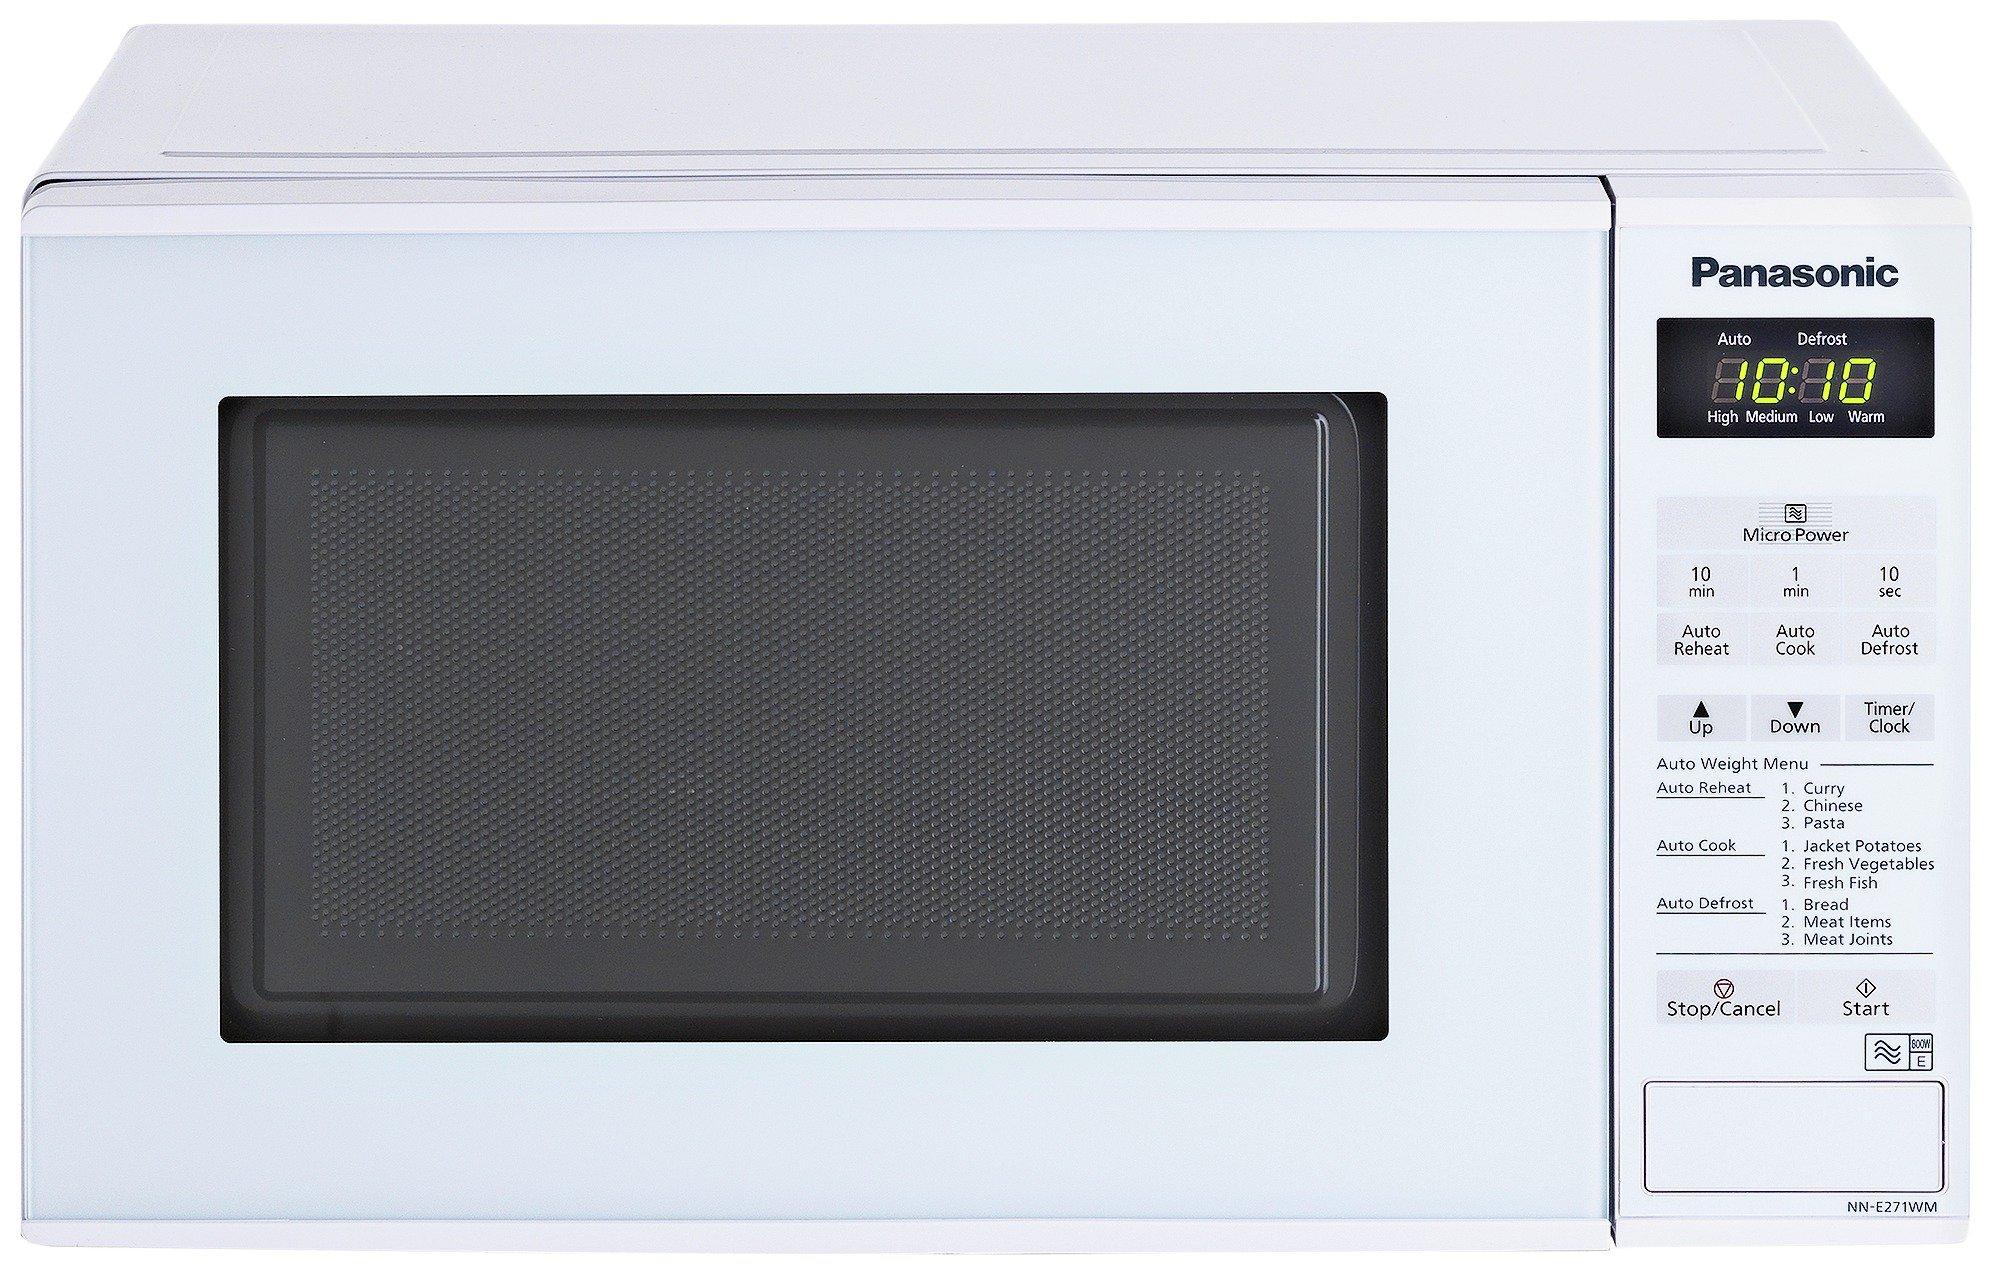 'Panasonic - Nn-e271wmbpq 800w Standard Microwave - White